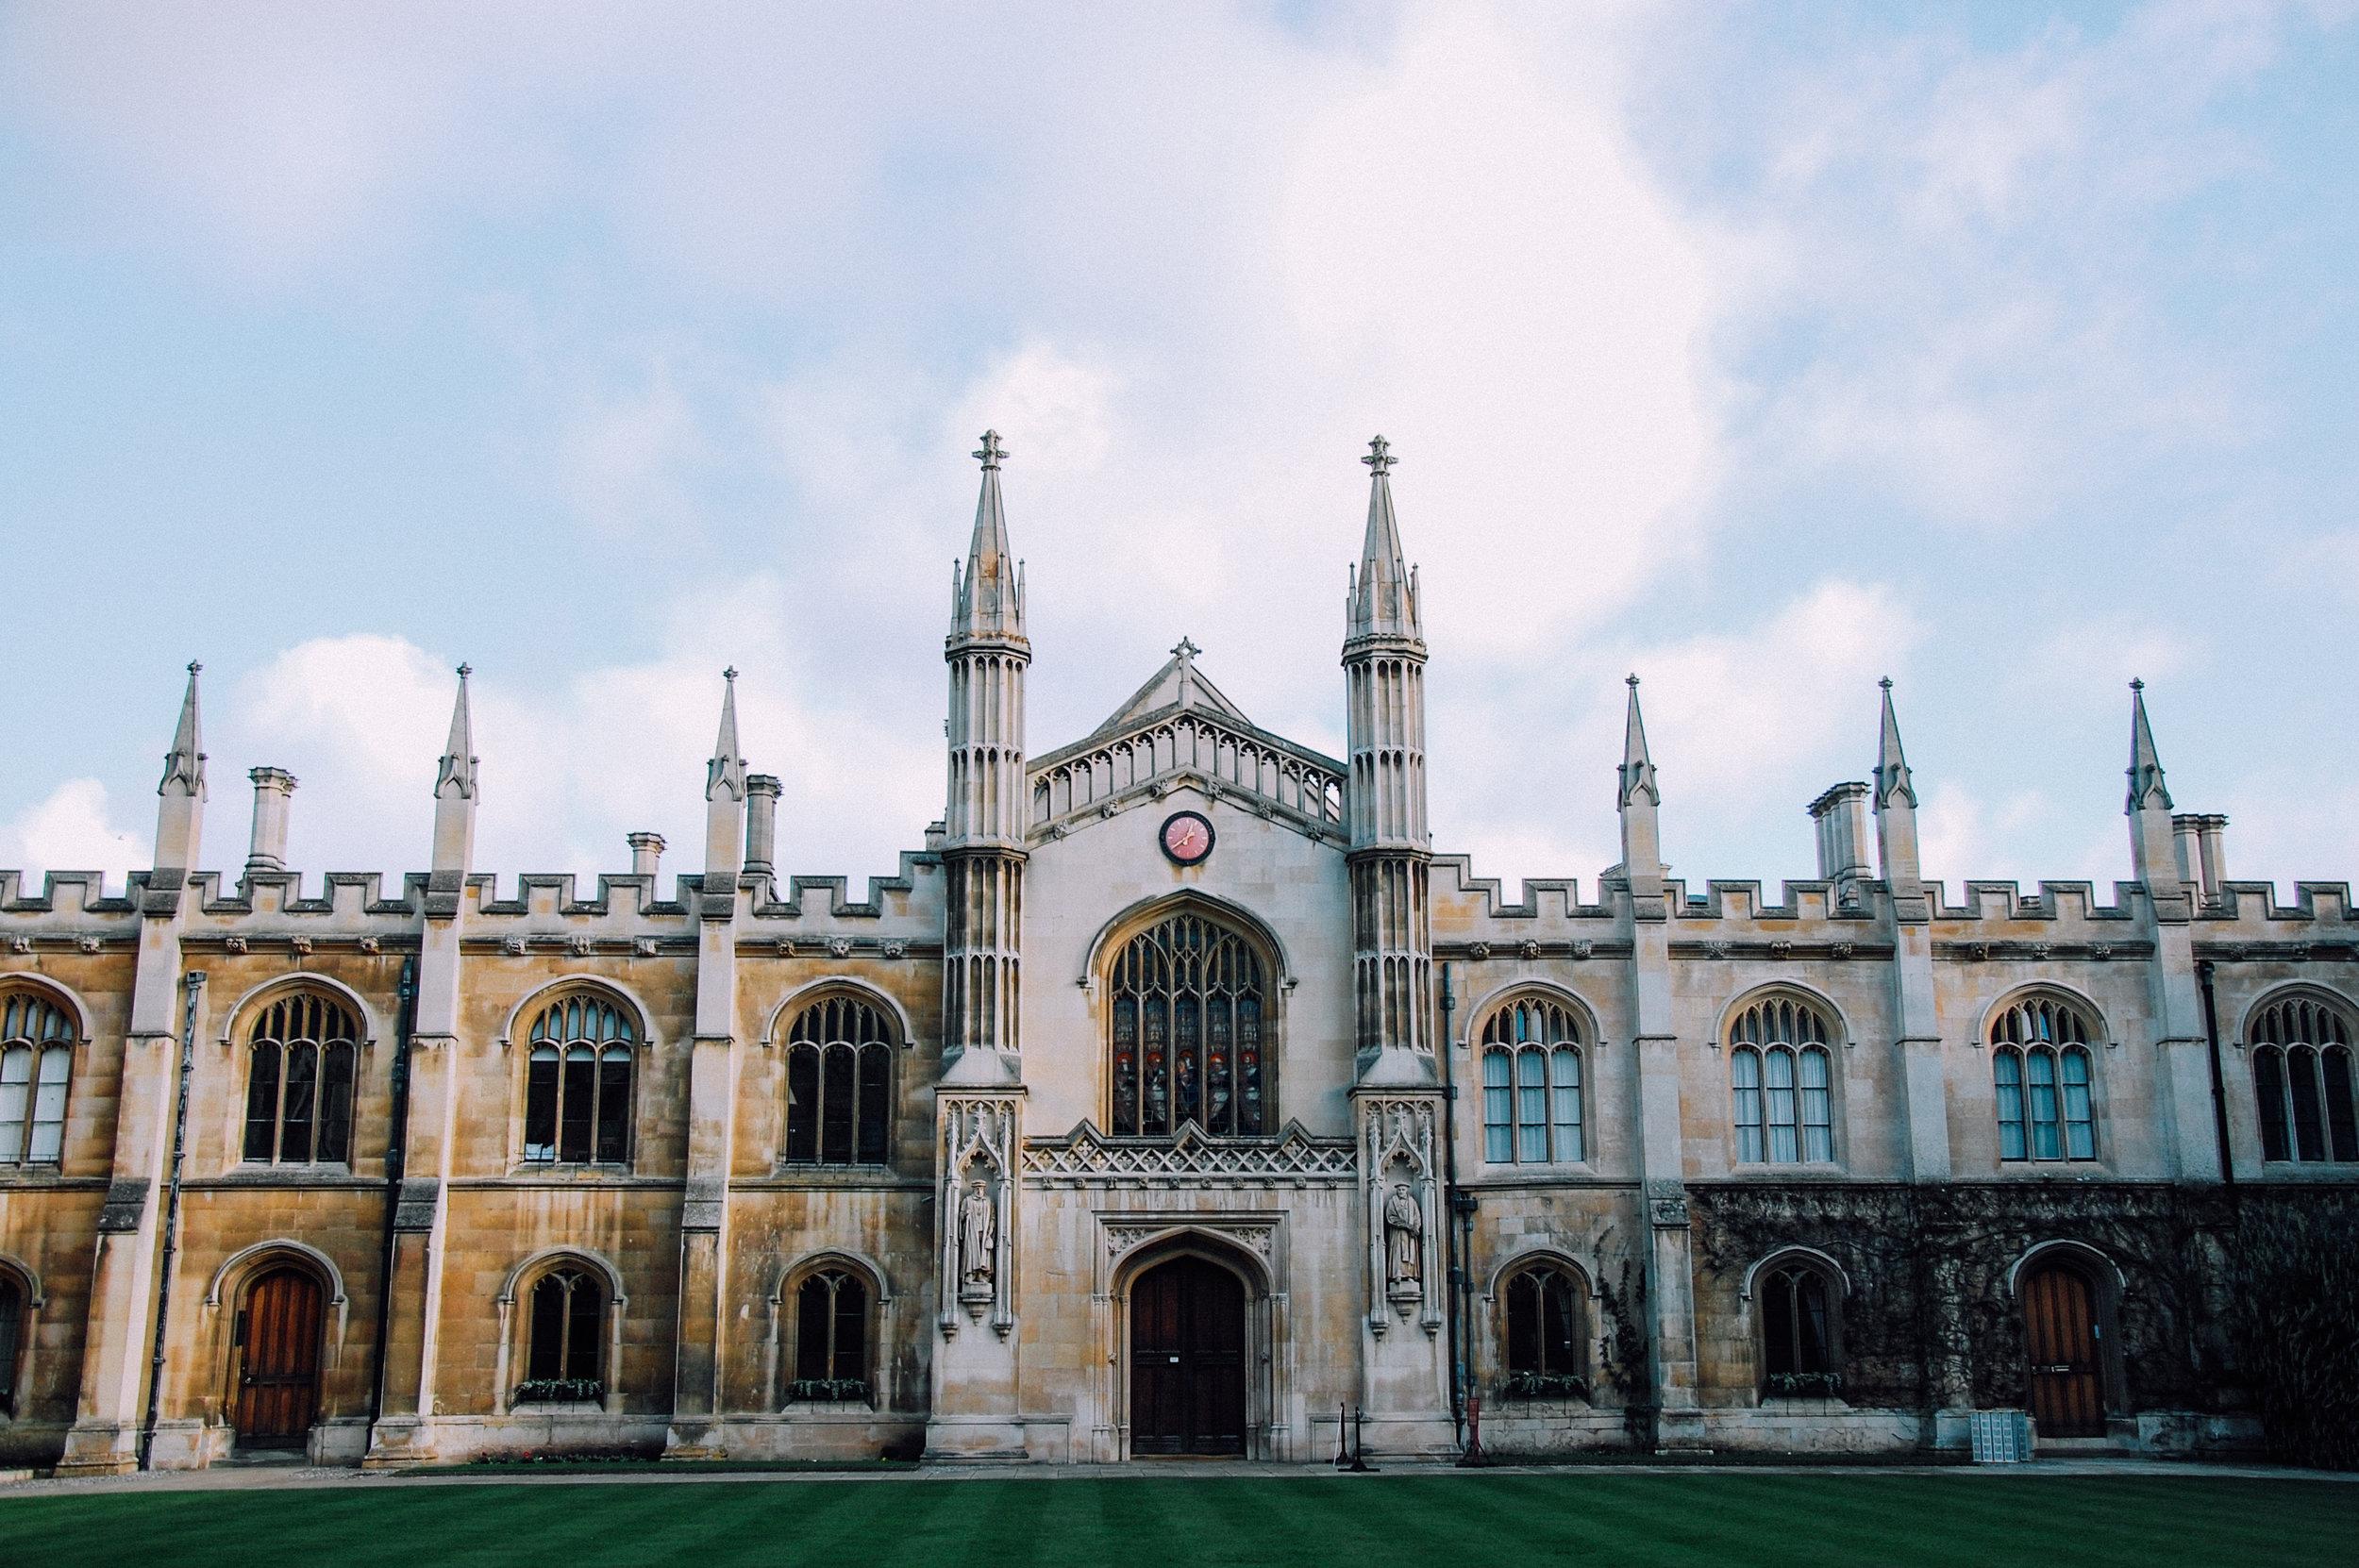 Cambridge130202-27.jpg